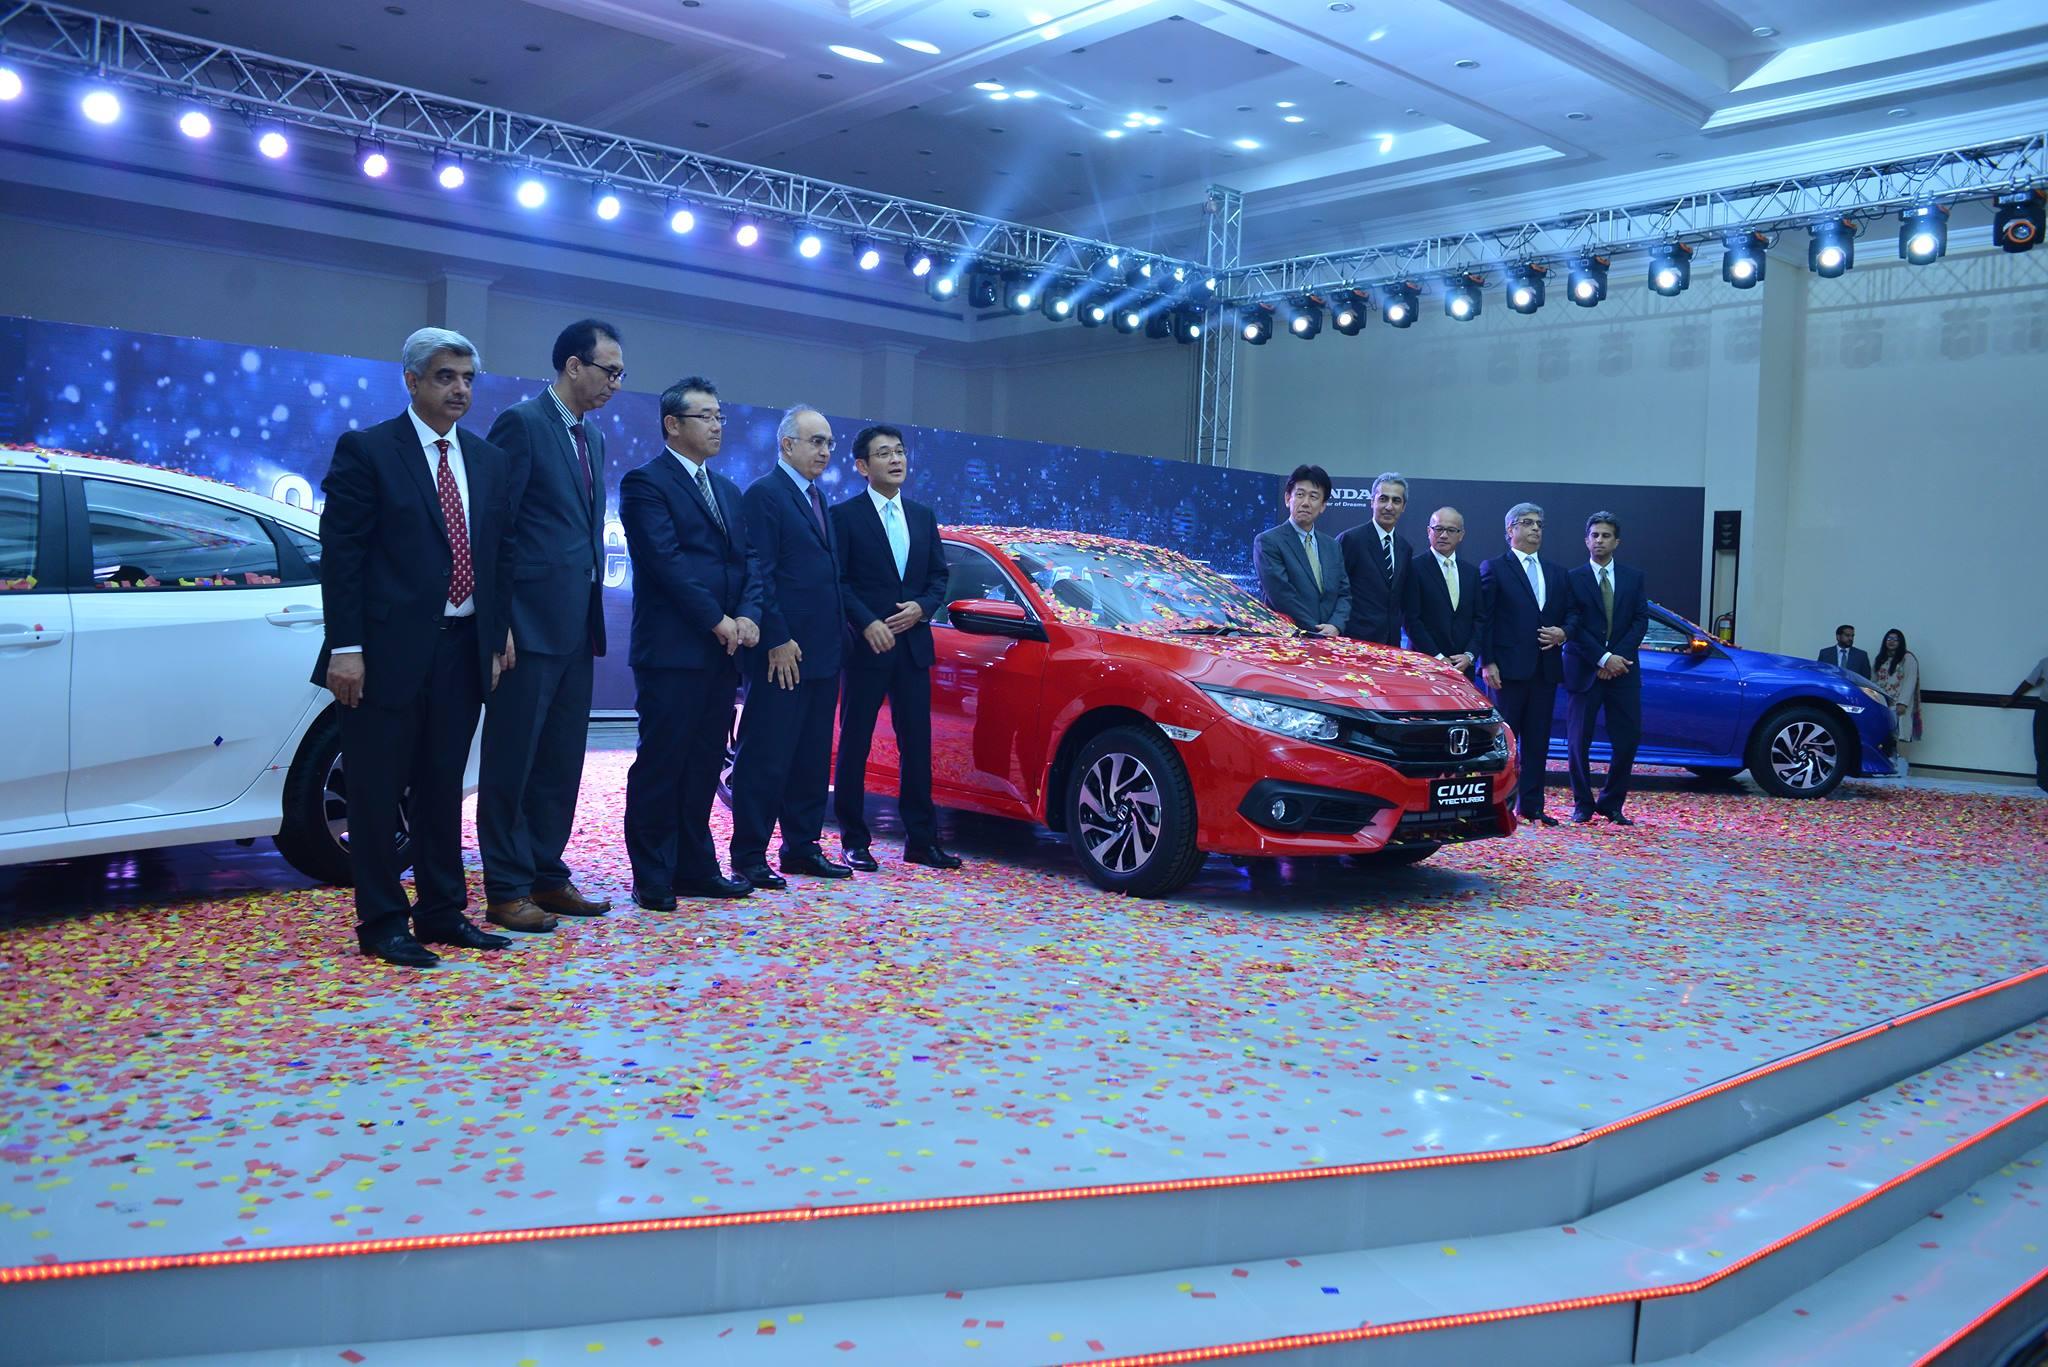 2016 Honda Civic Launch Event